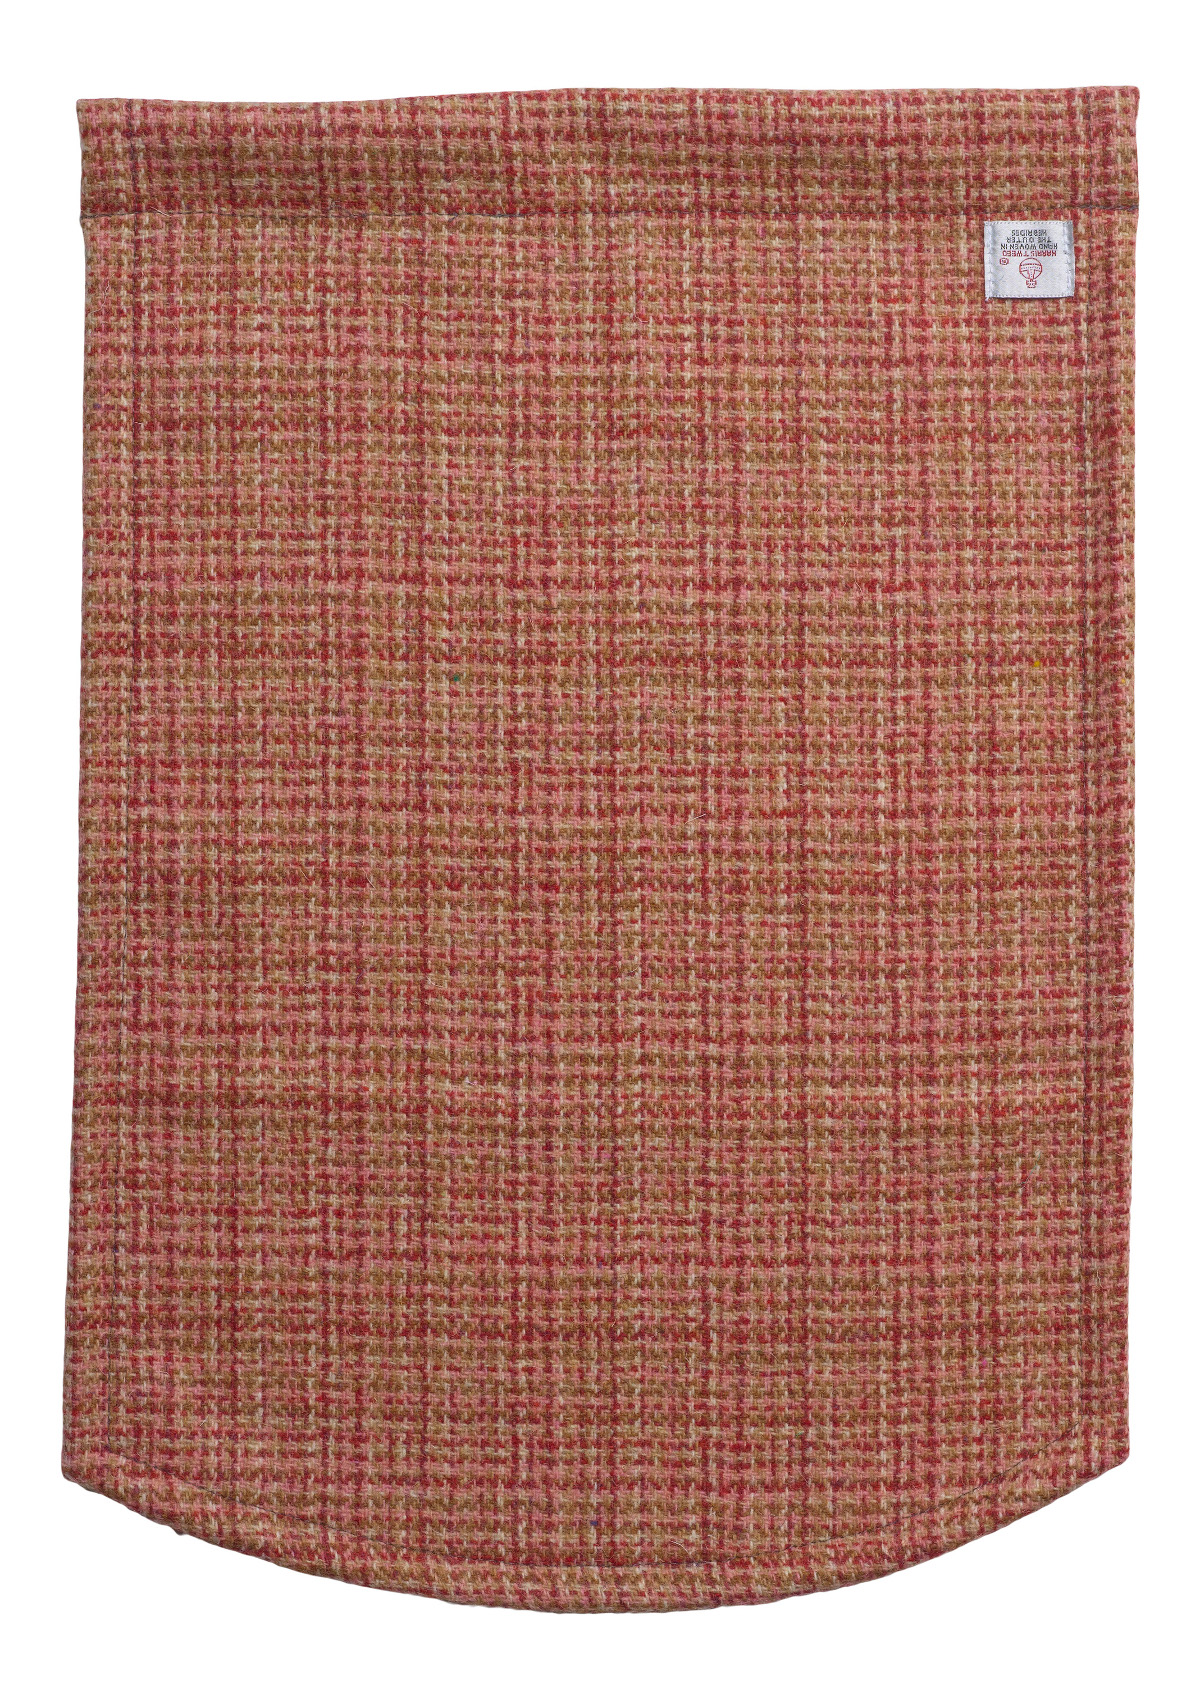 Single Antimacassar Chairback Pure New Wool Check Harris